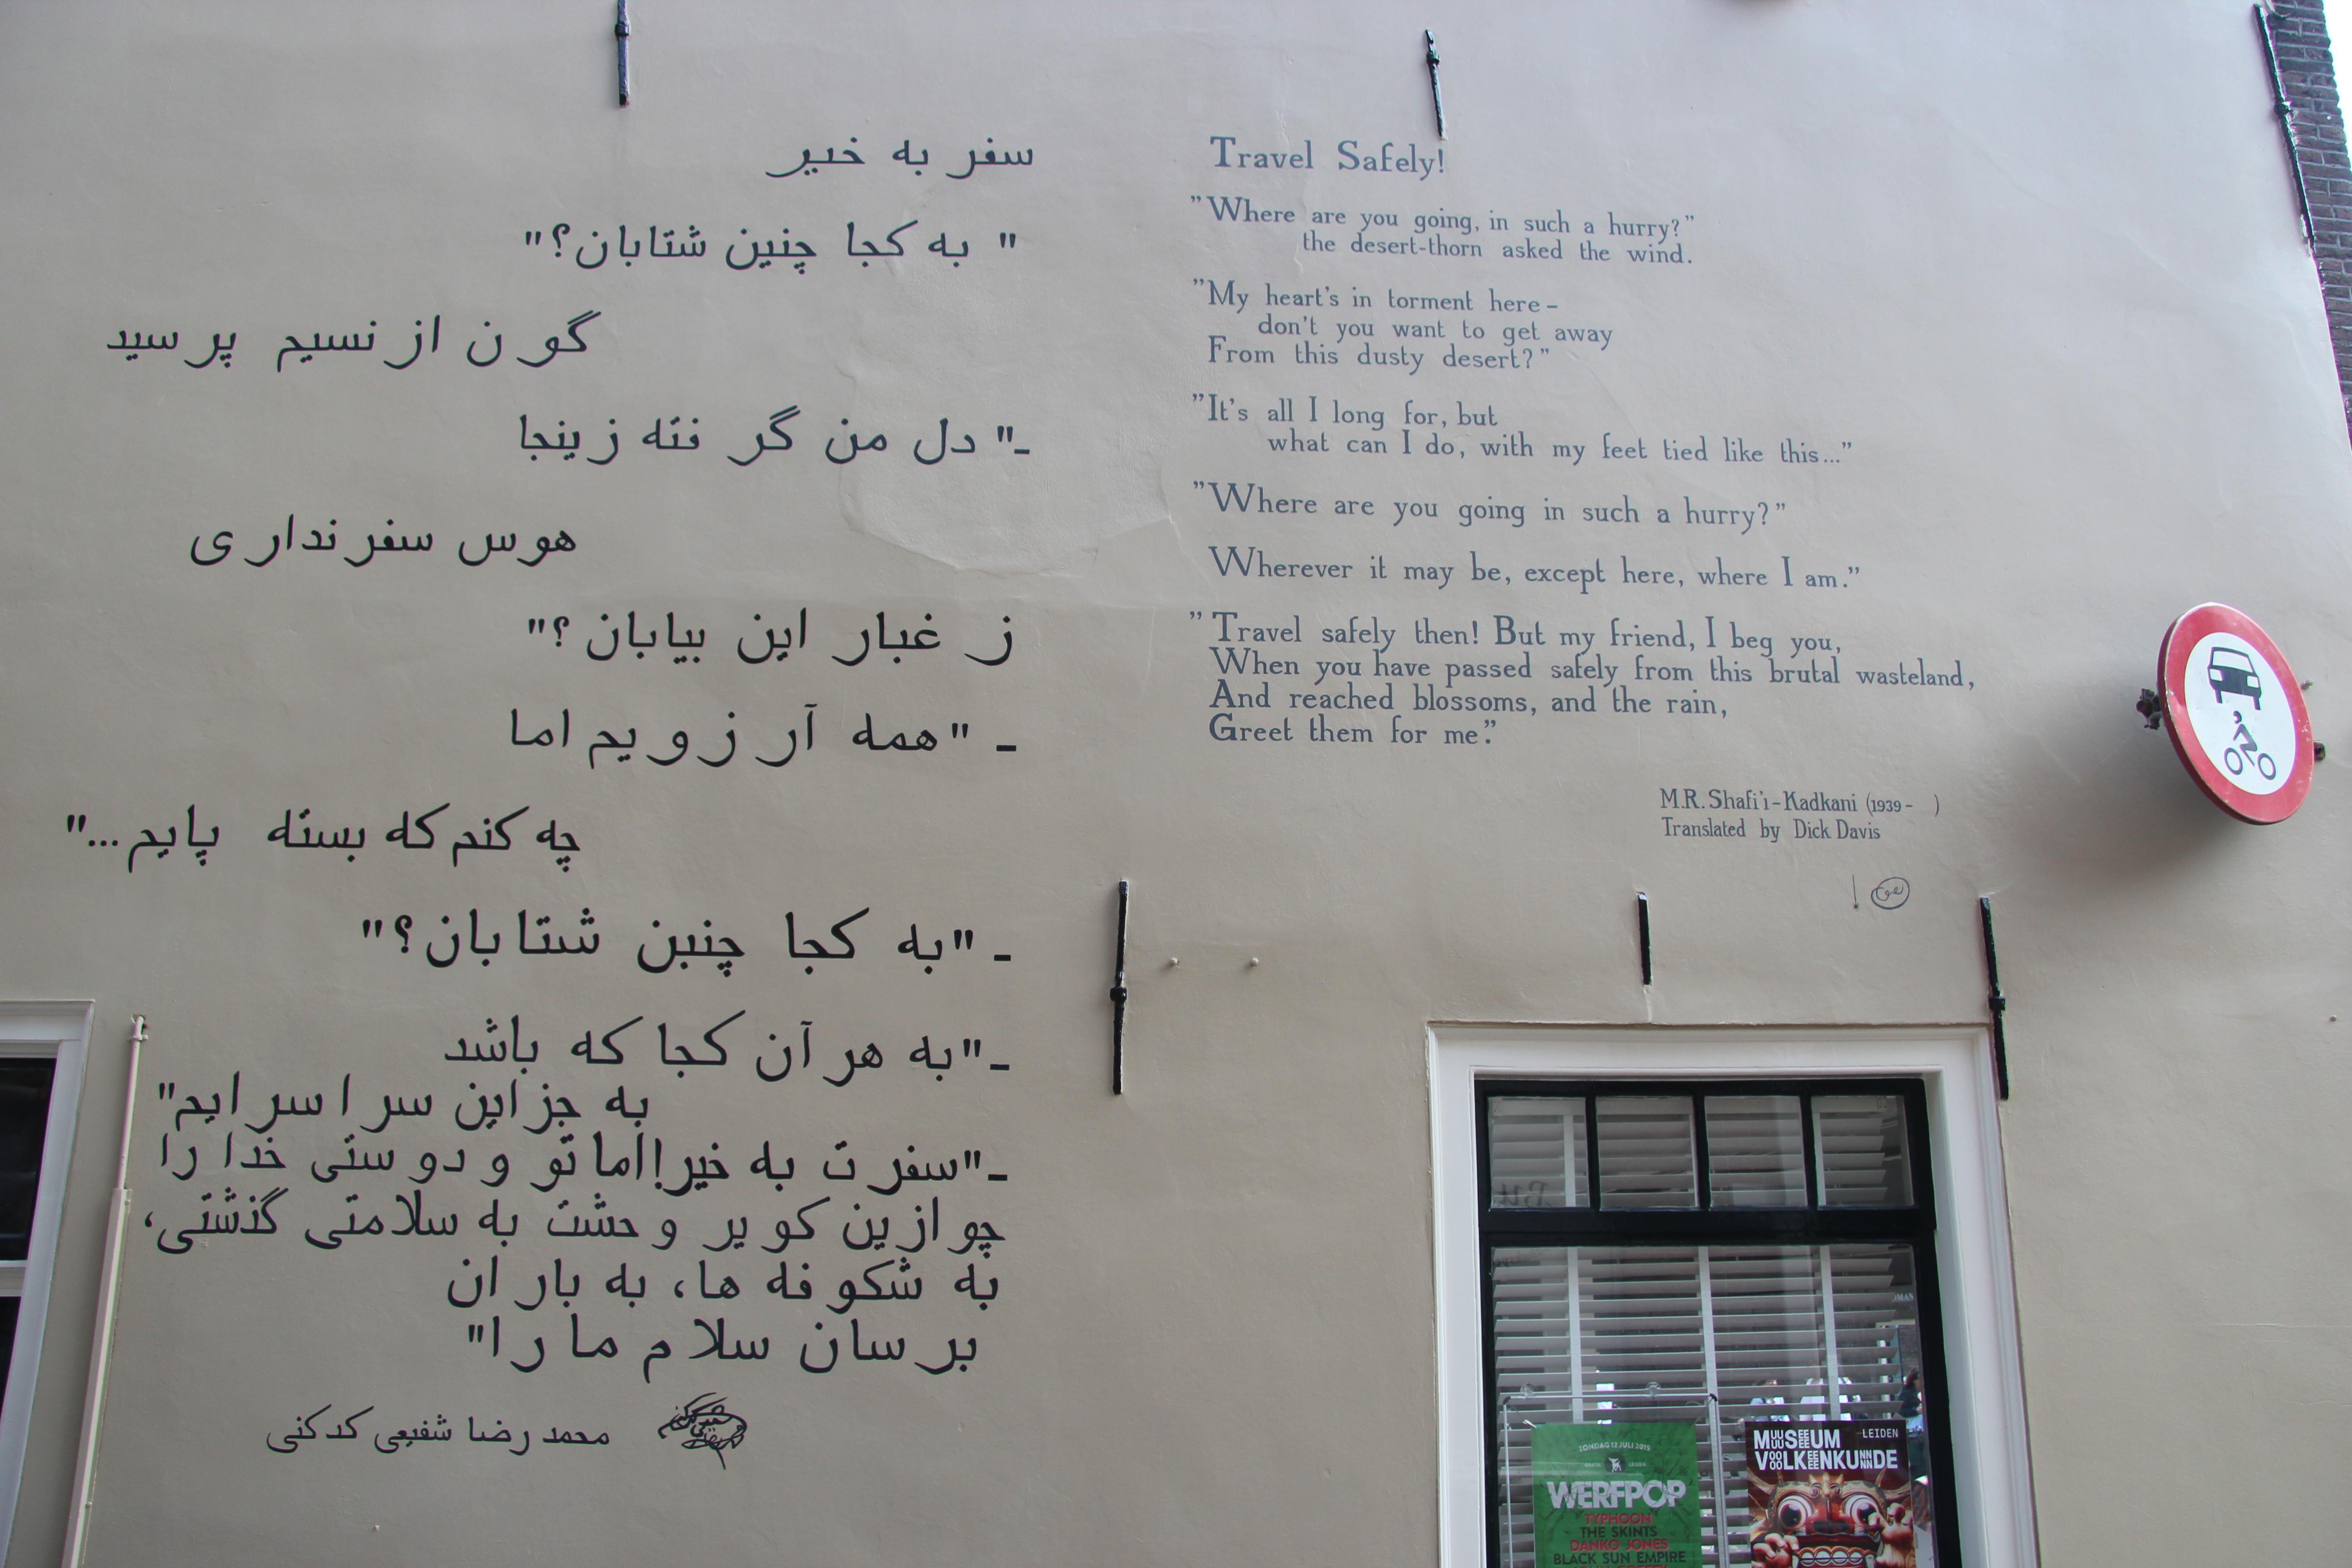 https://upload.wikimedia.org/wikipedia/commons/d/d9/Mohammad-Reza_Shafiei_Kadkani_-_Travel_Safely.JPG